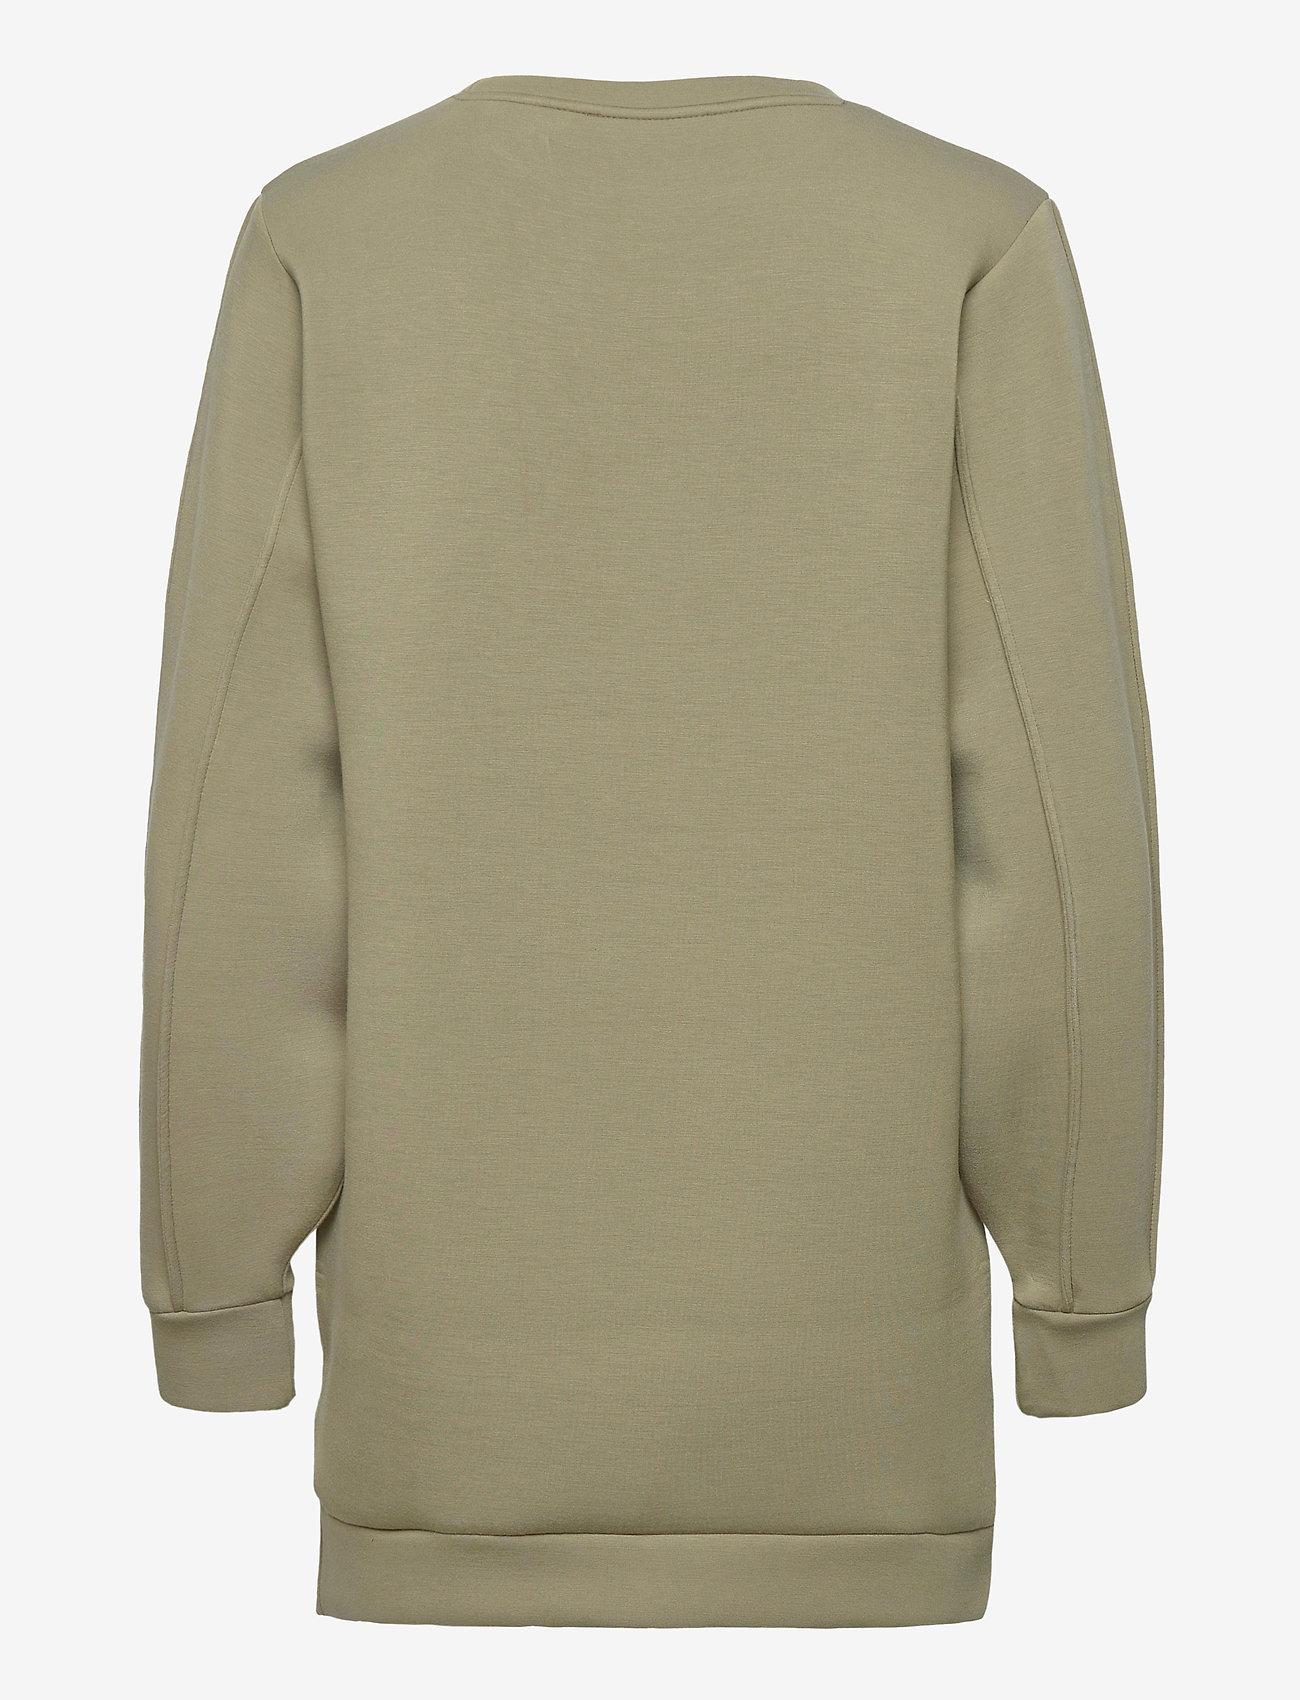 GUESS Jeans - SAMARAH DRESS - vardagsklänningar - army sage - 1